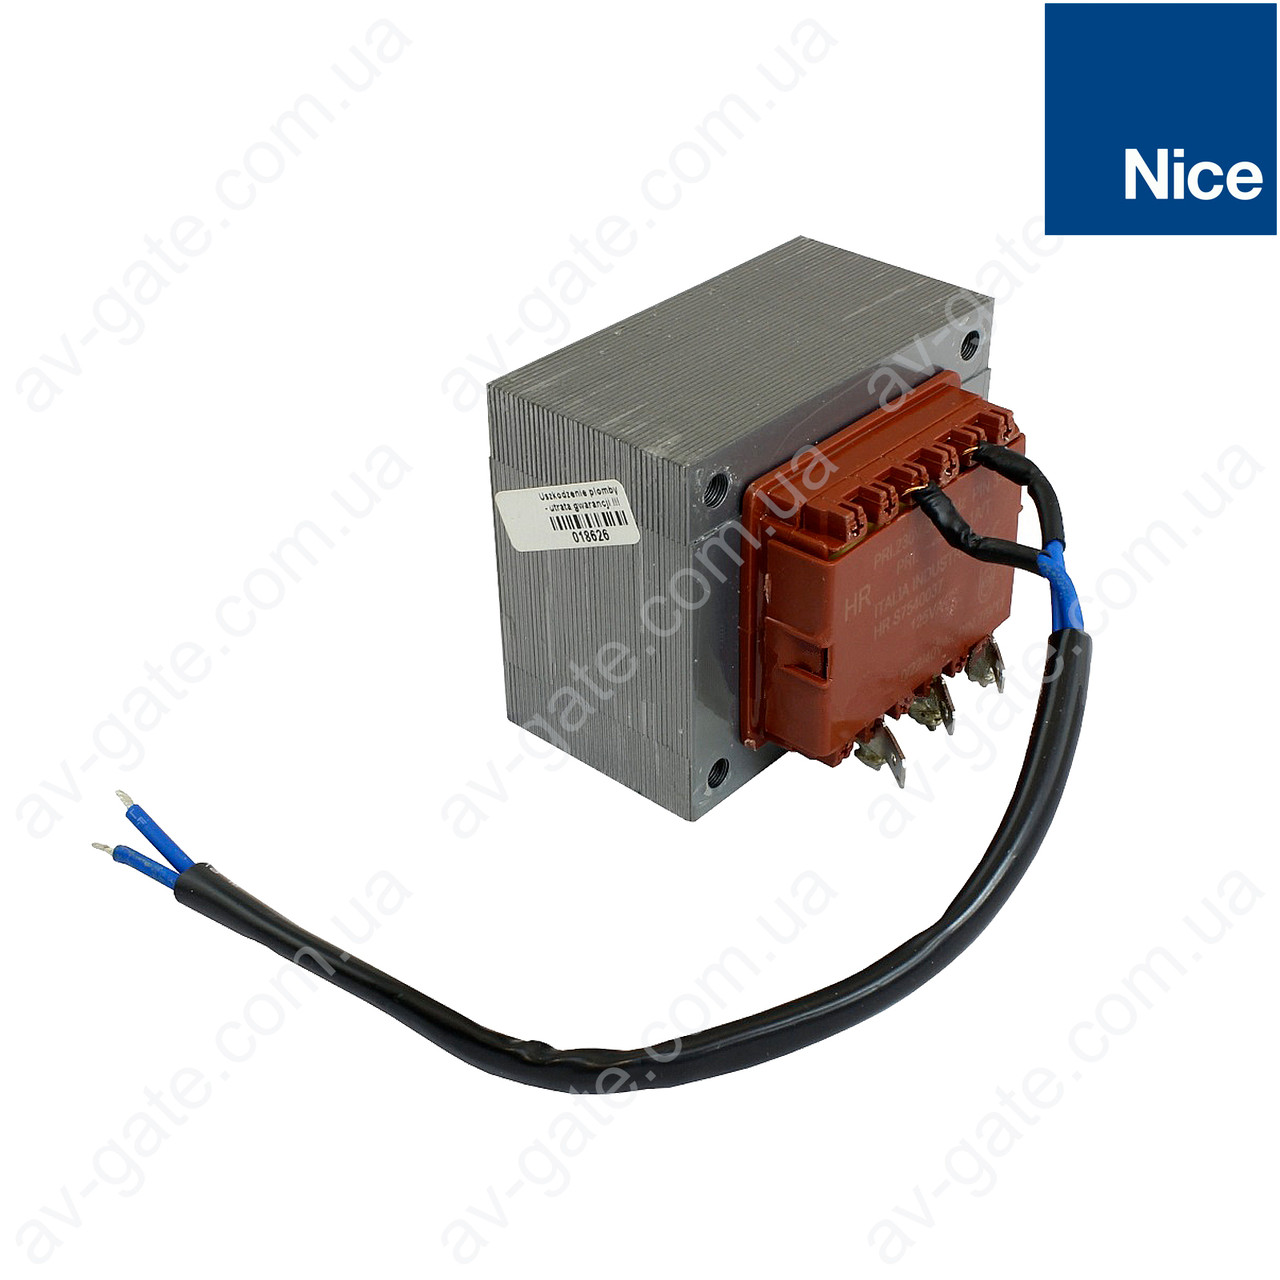 Трансформатор SPIDO / SHEL Nice TRA-S6.1025